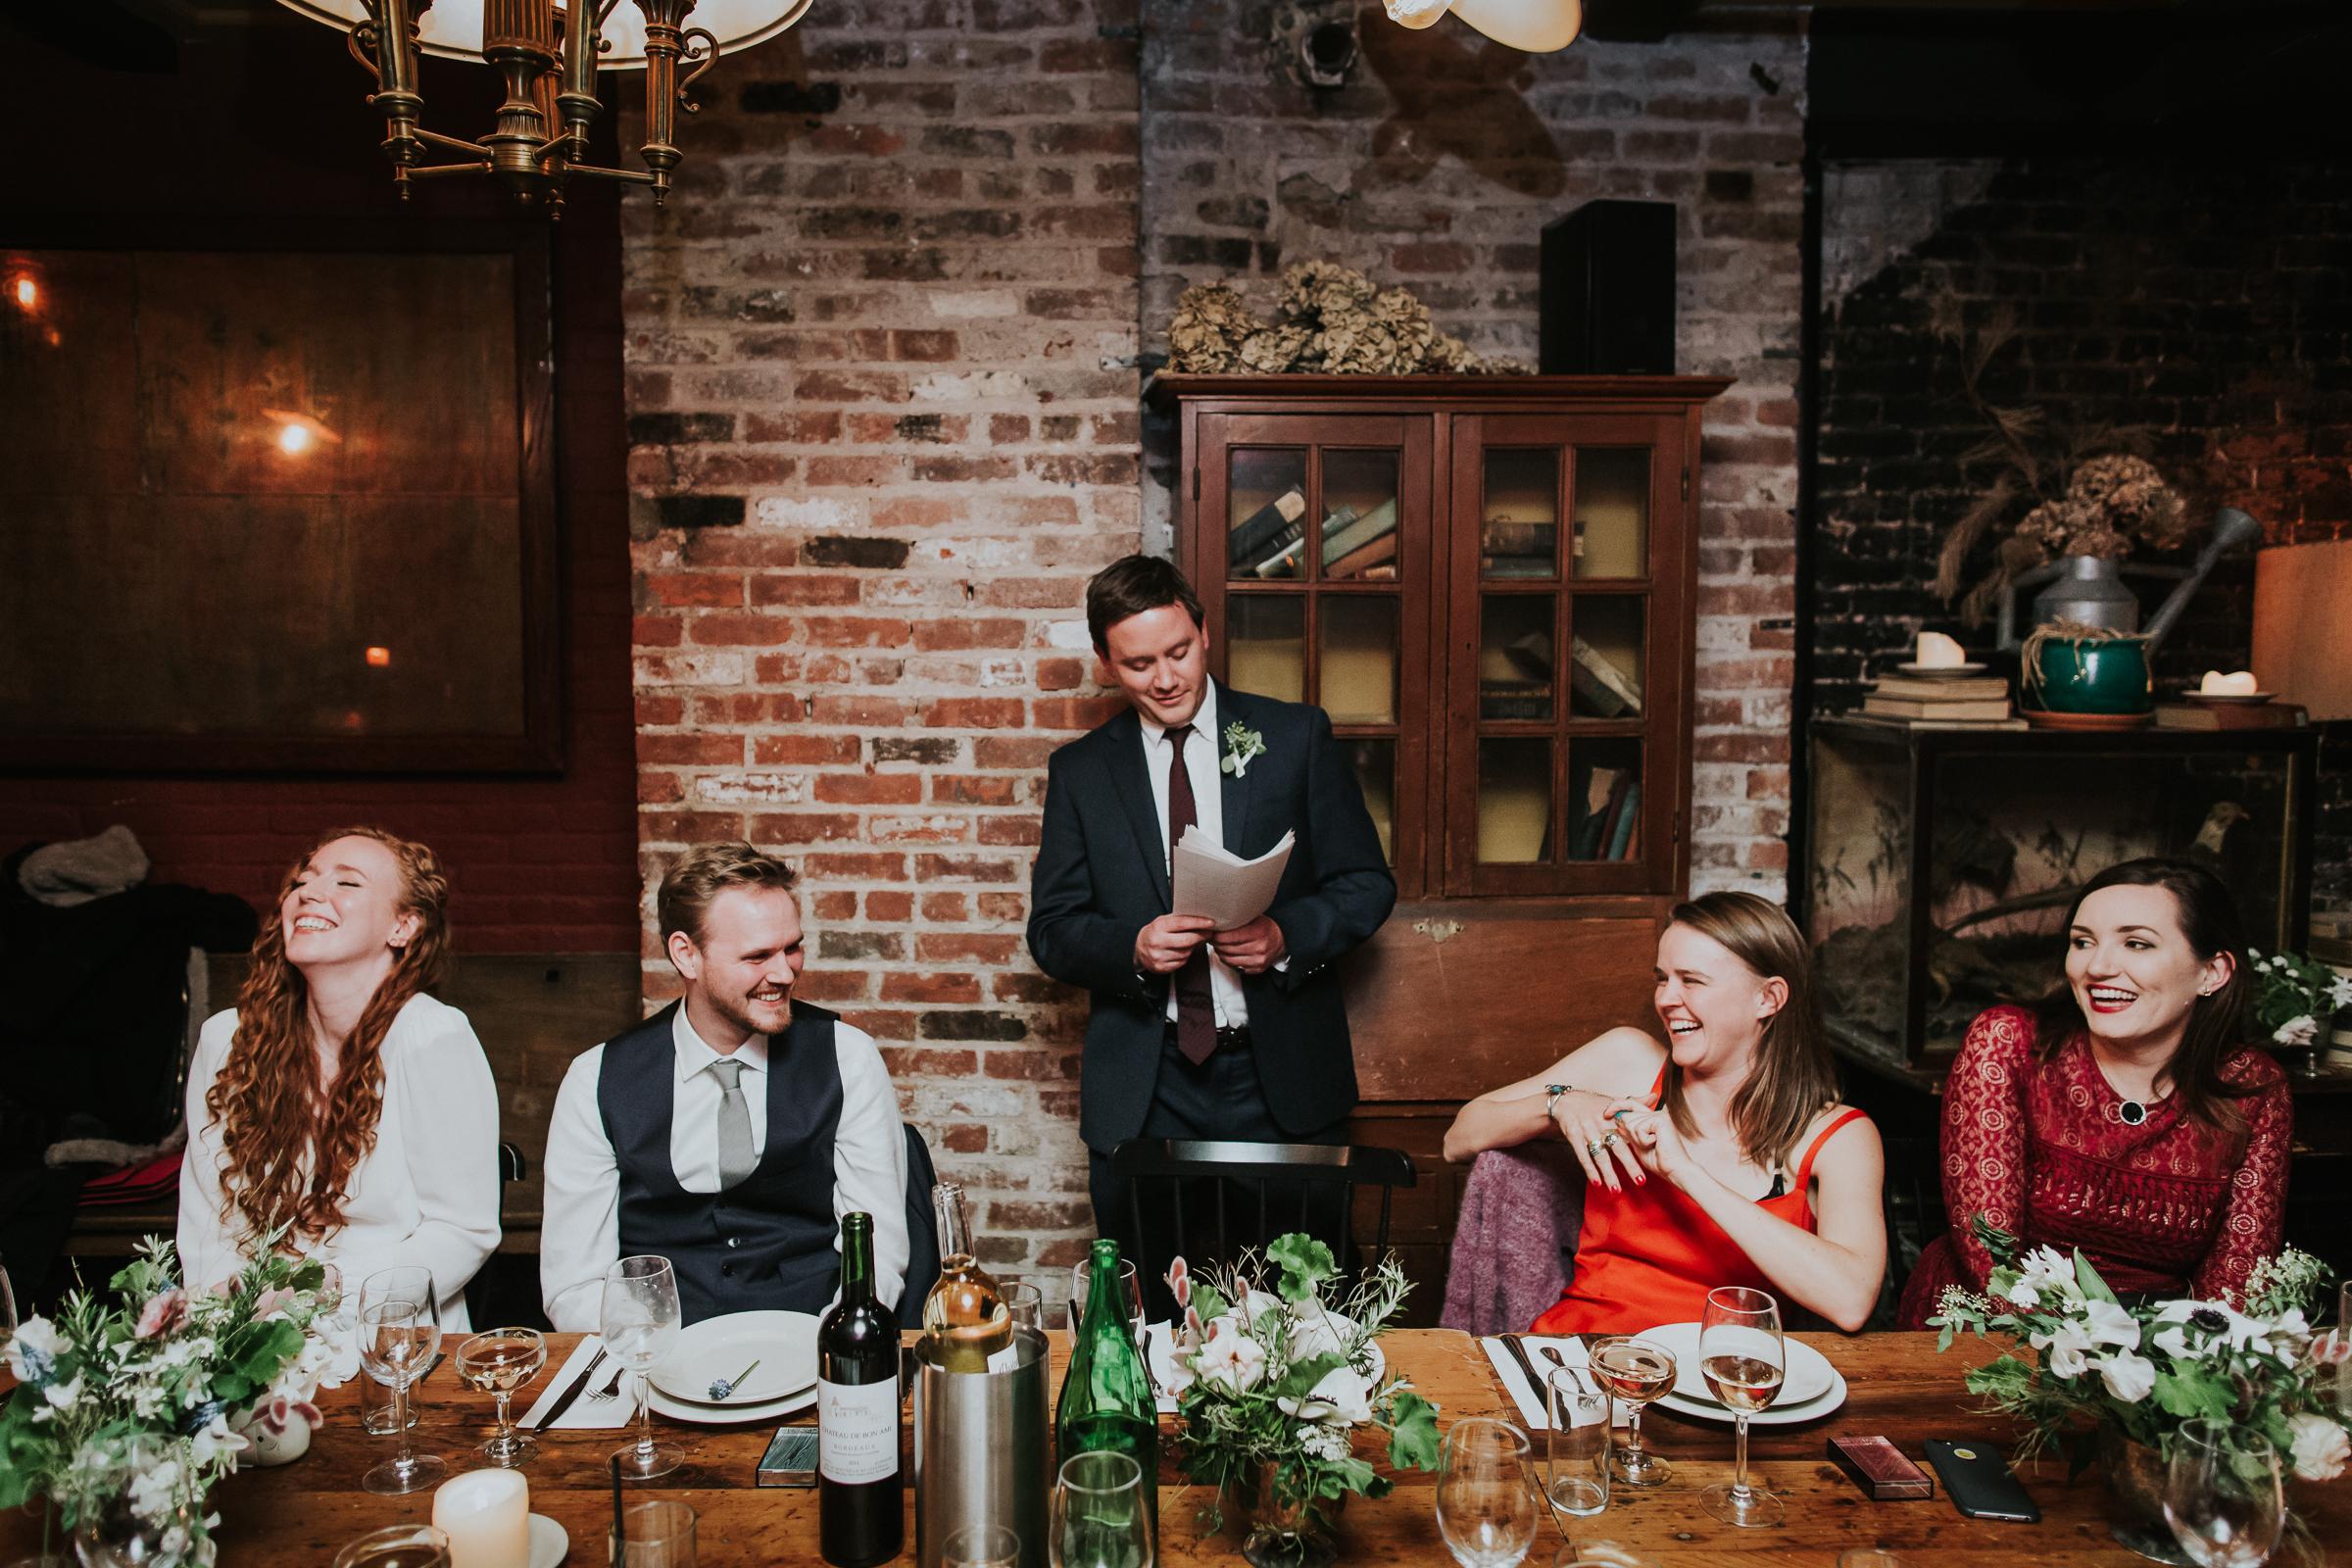 Freemans-Restaurant-Soho-Brooklyn-Bridge-Park-Dumbo-Documentary-Wedding-Photographer-64.jpg